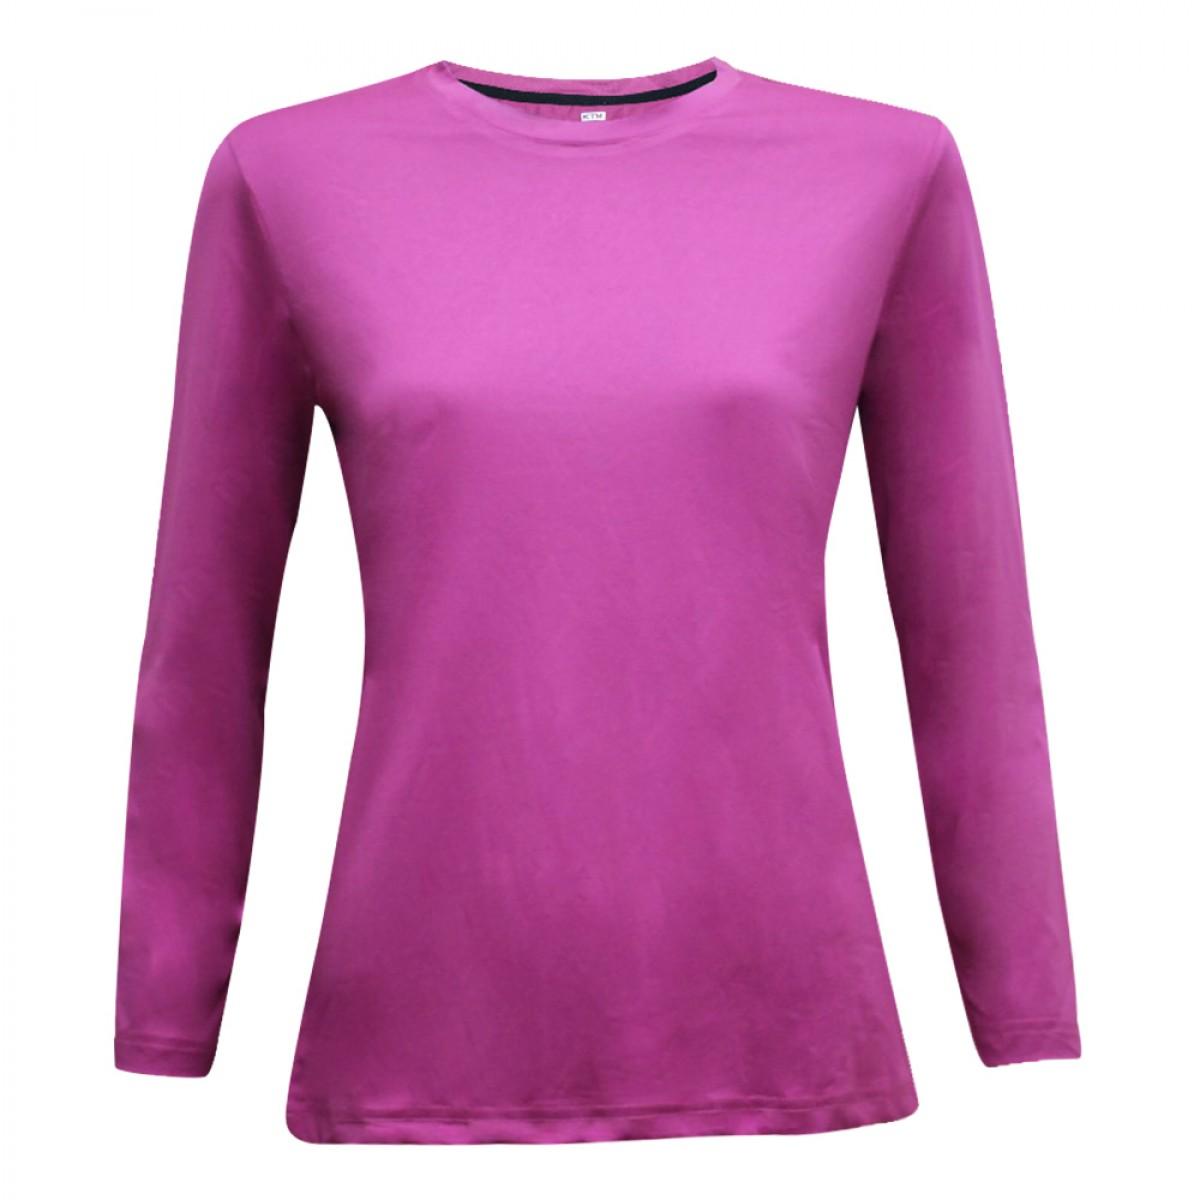 women-round-neck-ls-t-shirt-krt06910-2a